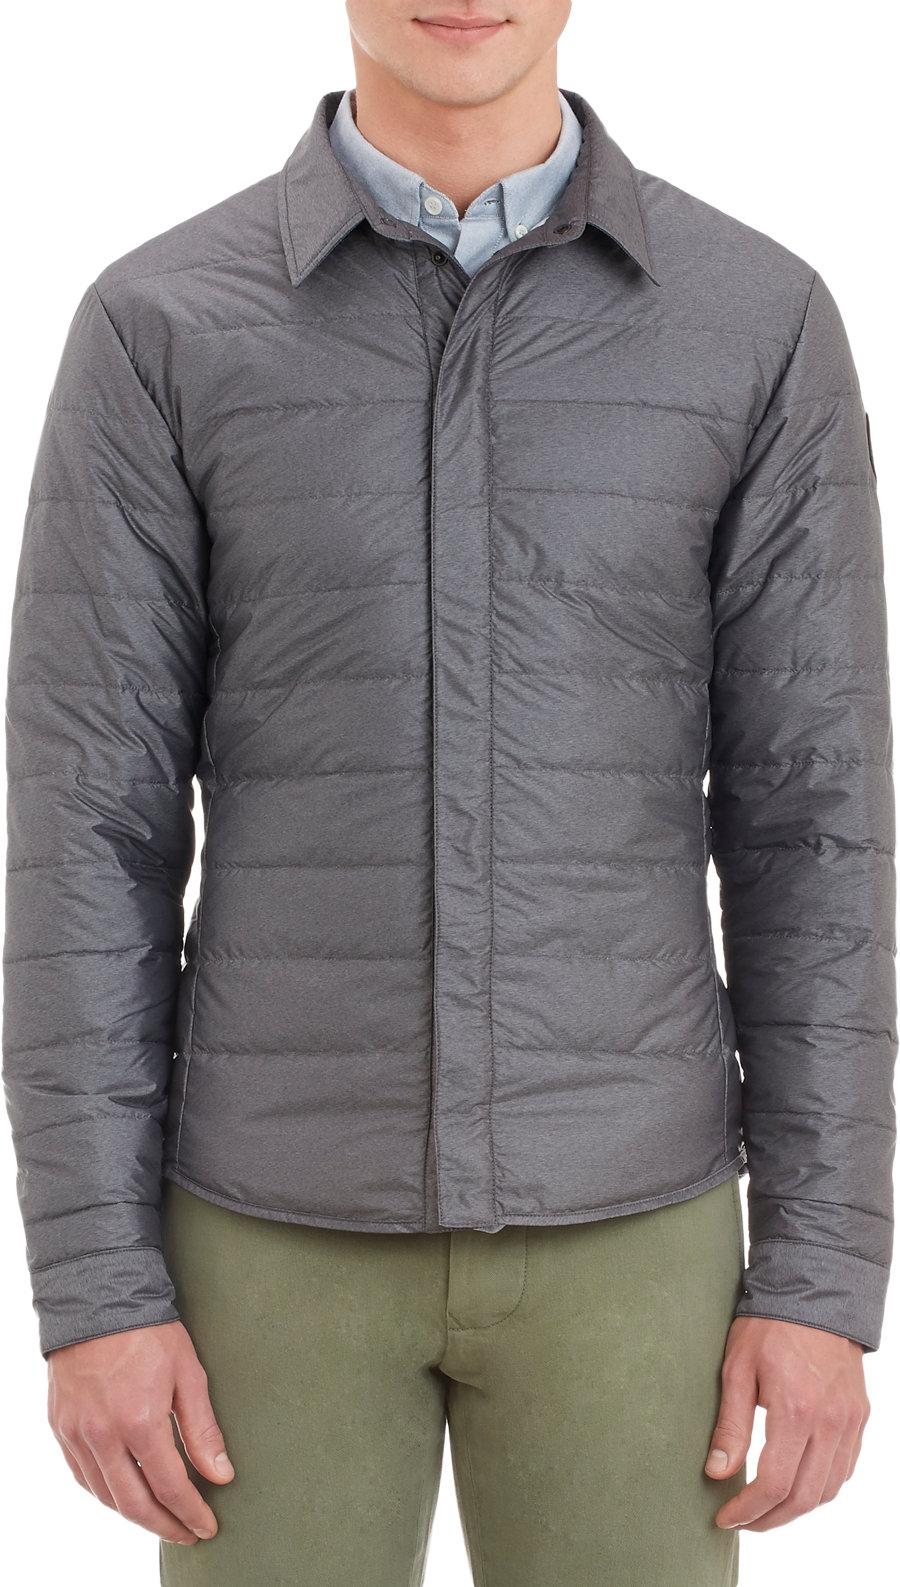 Canada Goose Lightweight Down Jacket In Gray For Men Grey